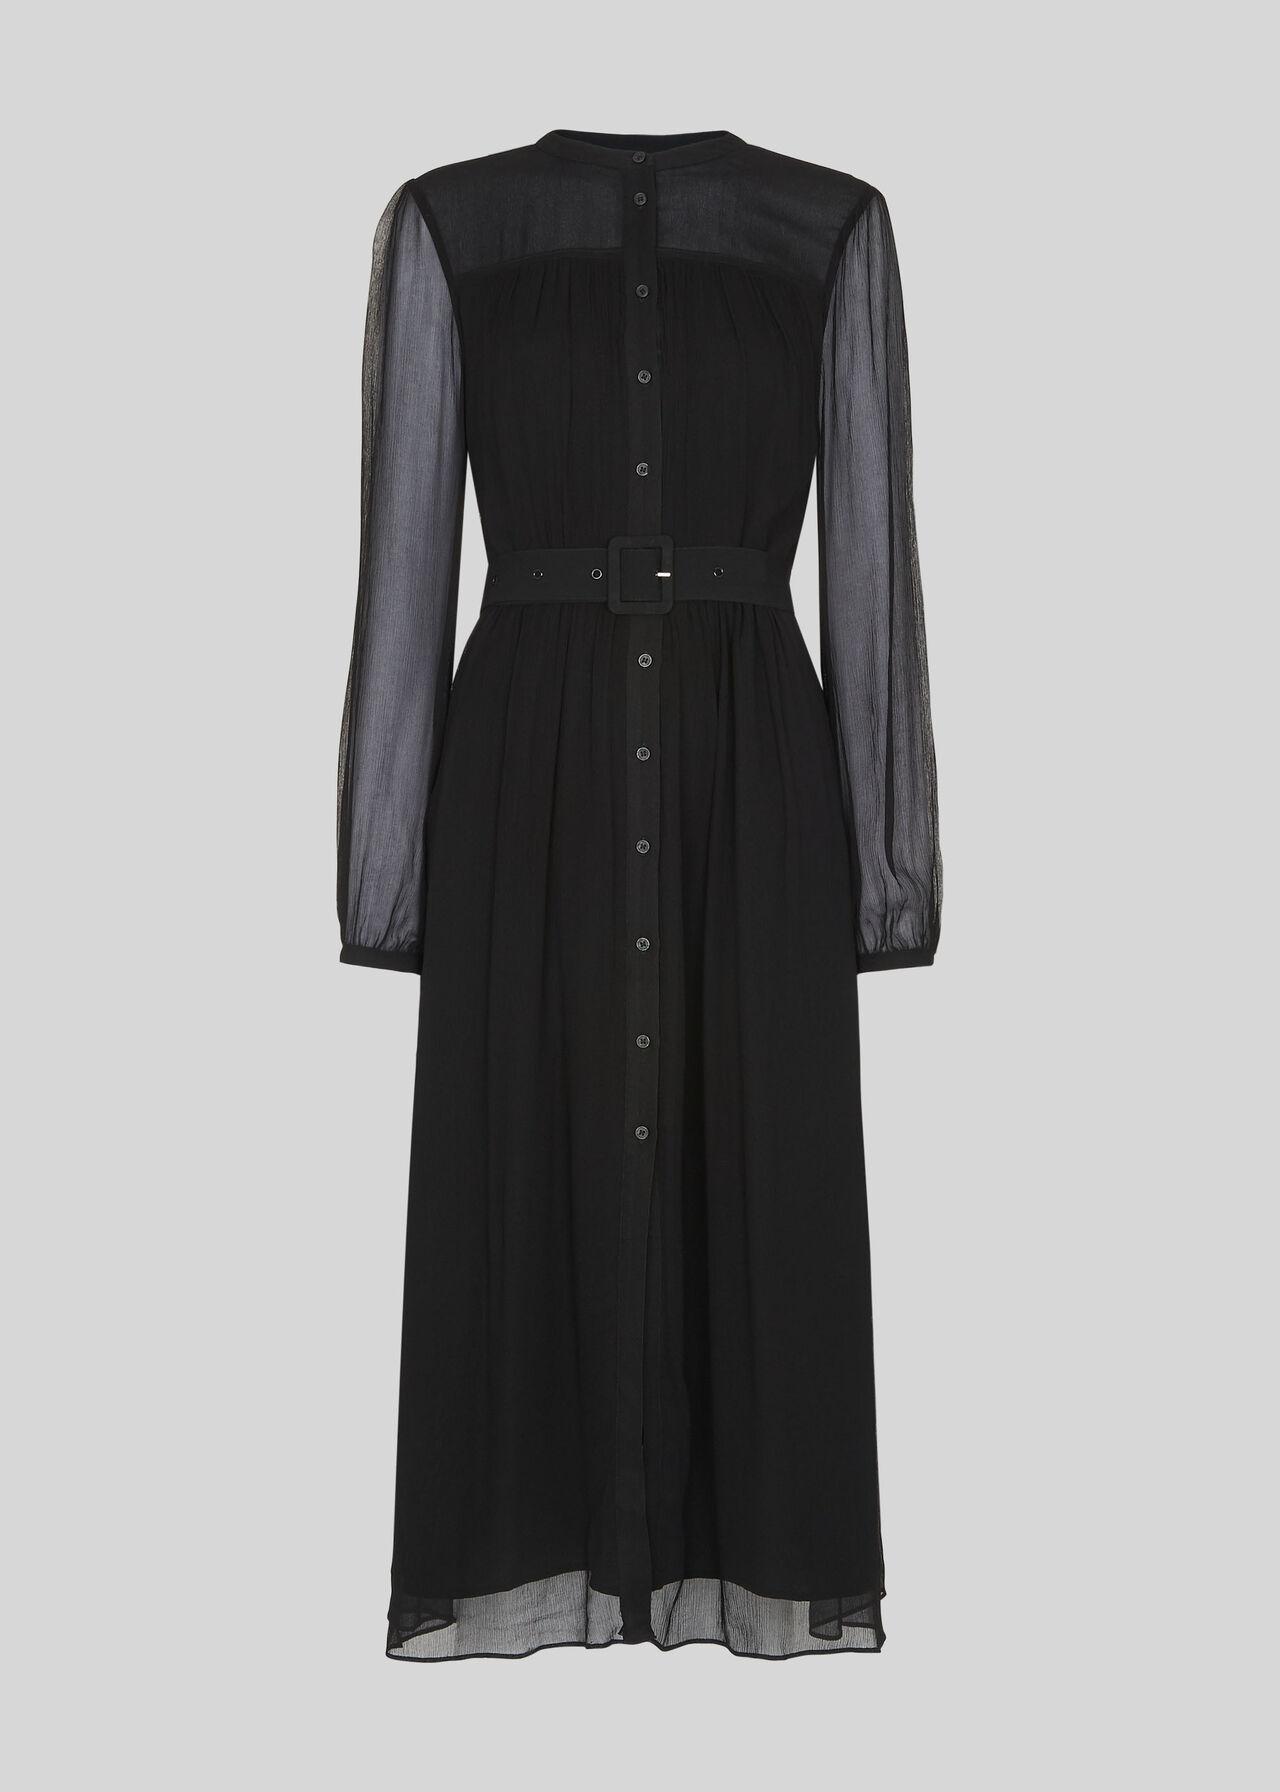 Bethany Belted Midi Dress Black